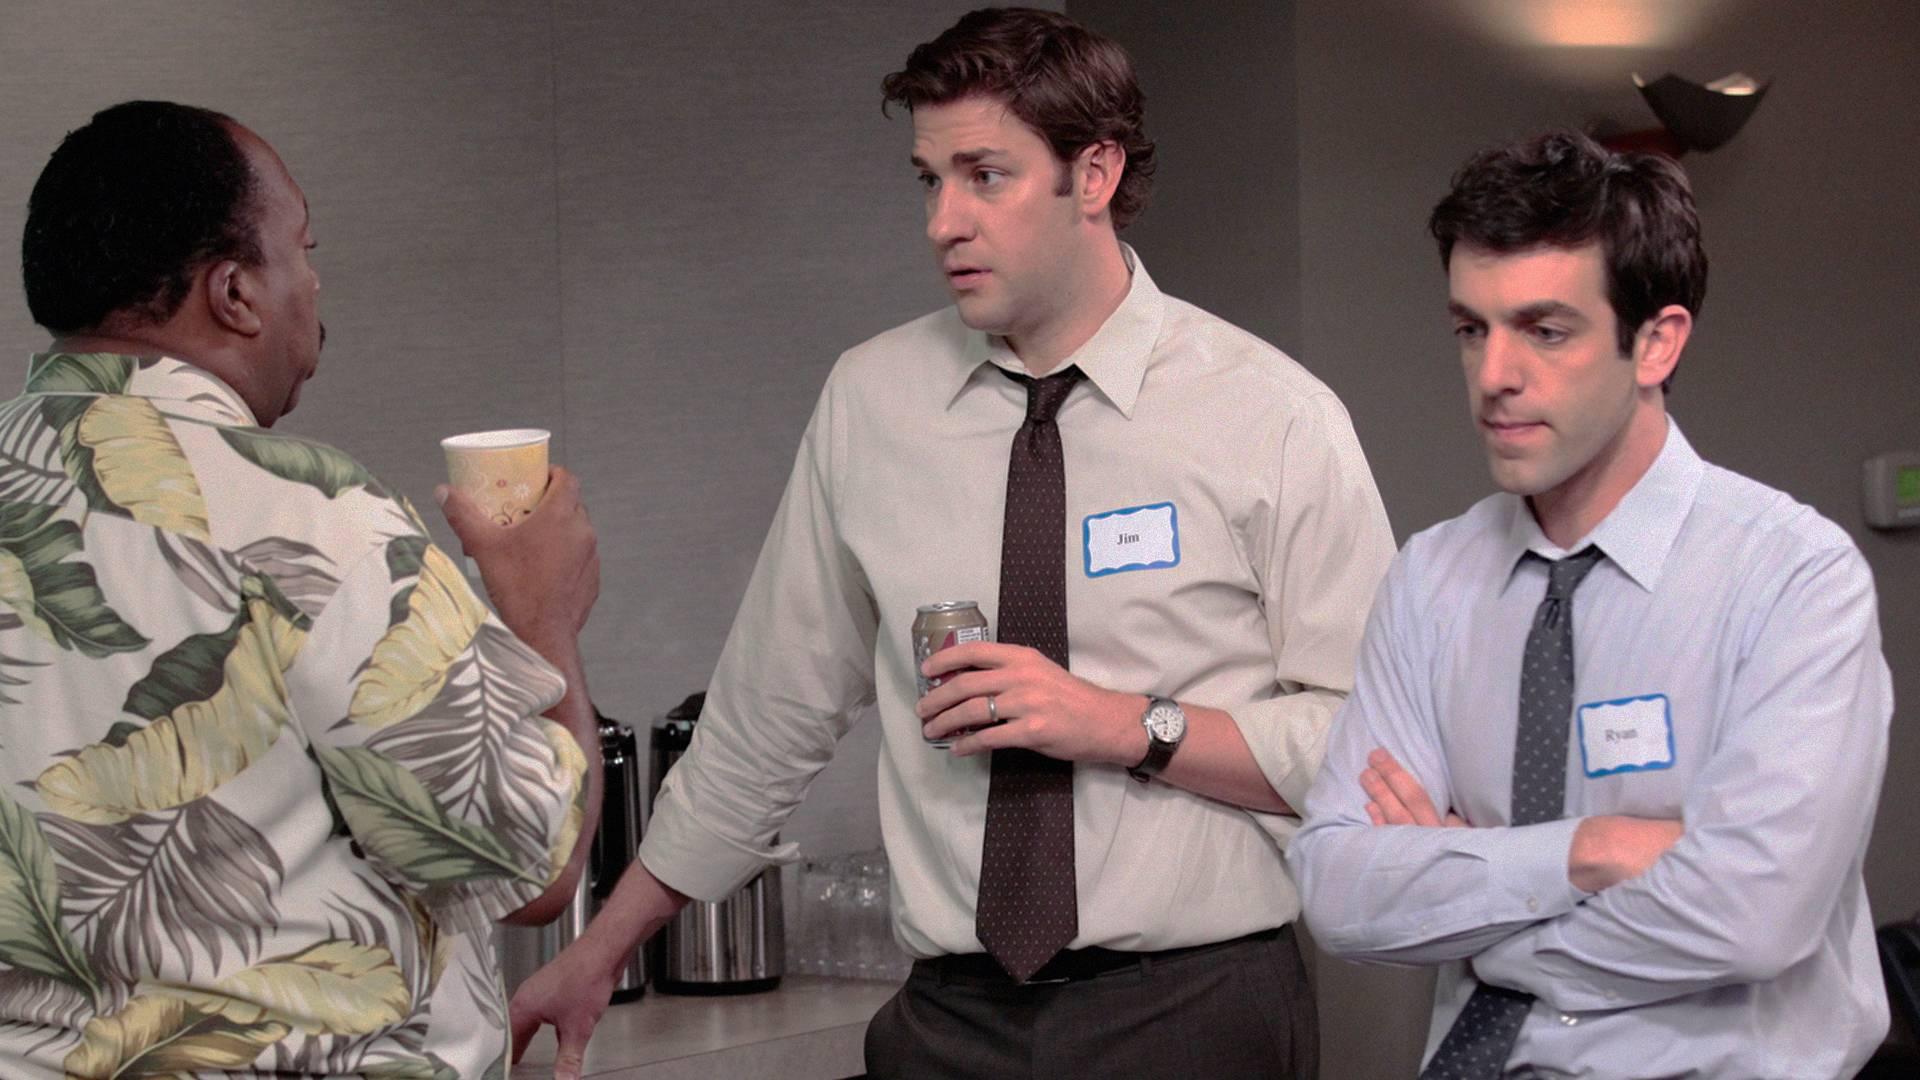 The Office Season 8 Episode 15